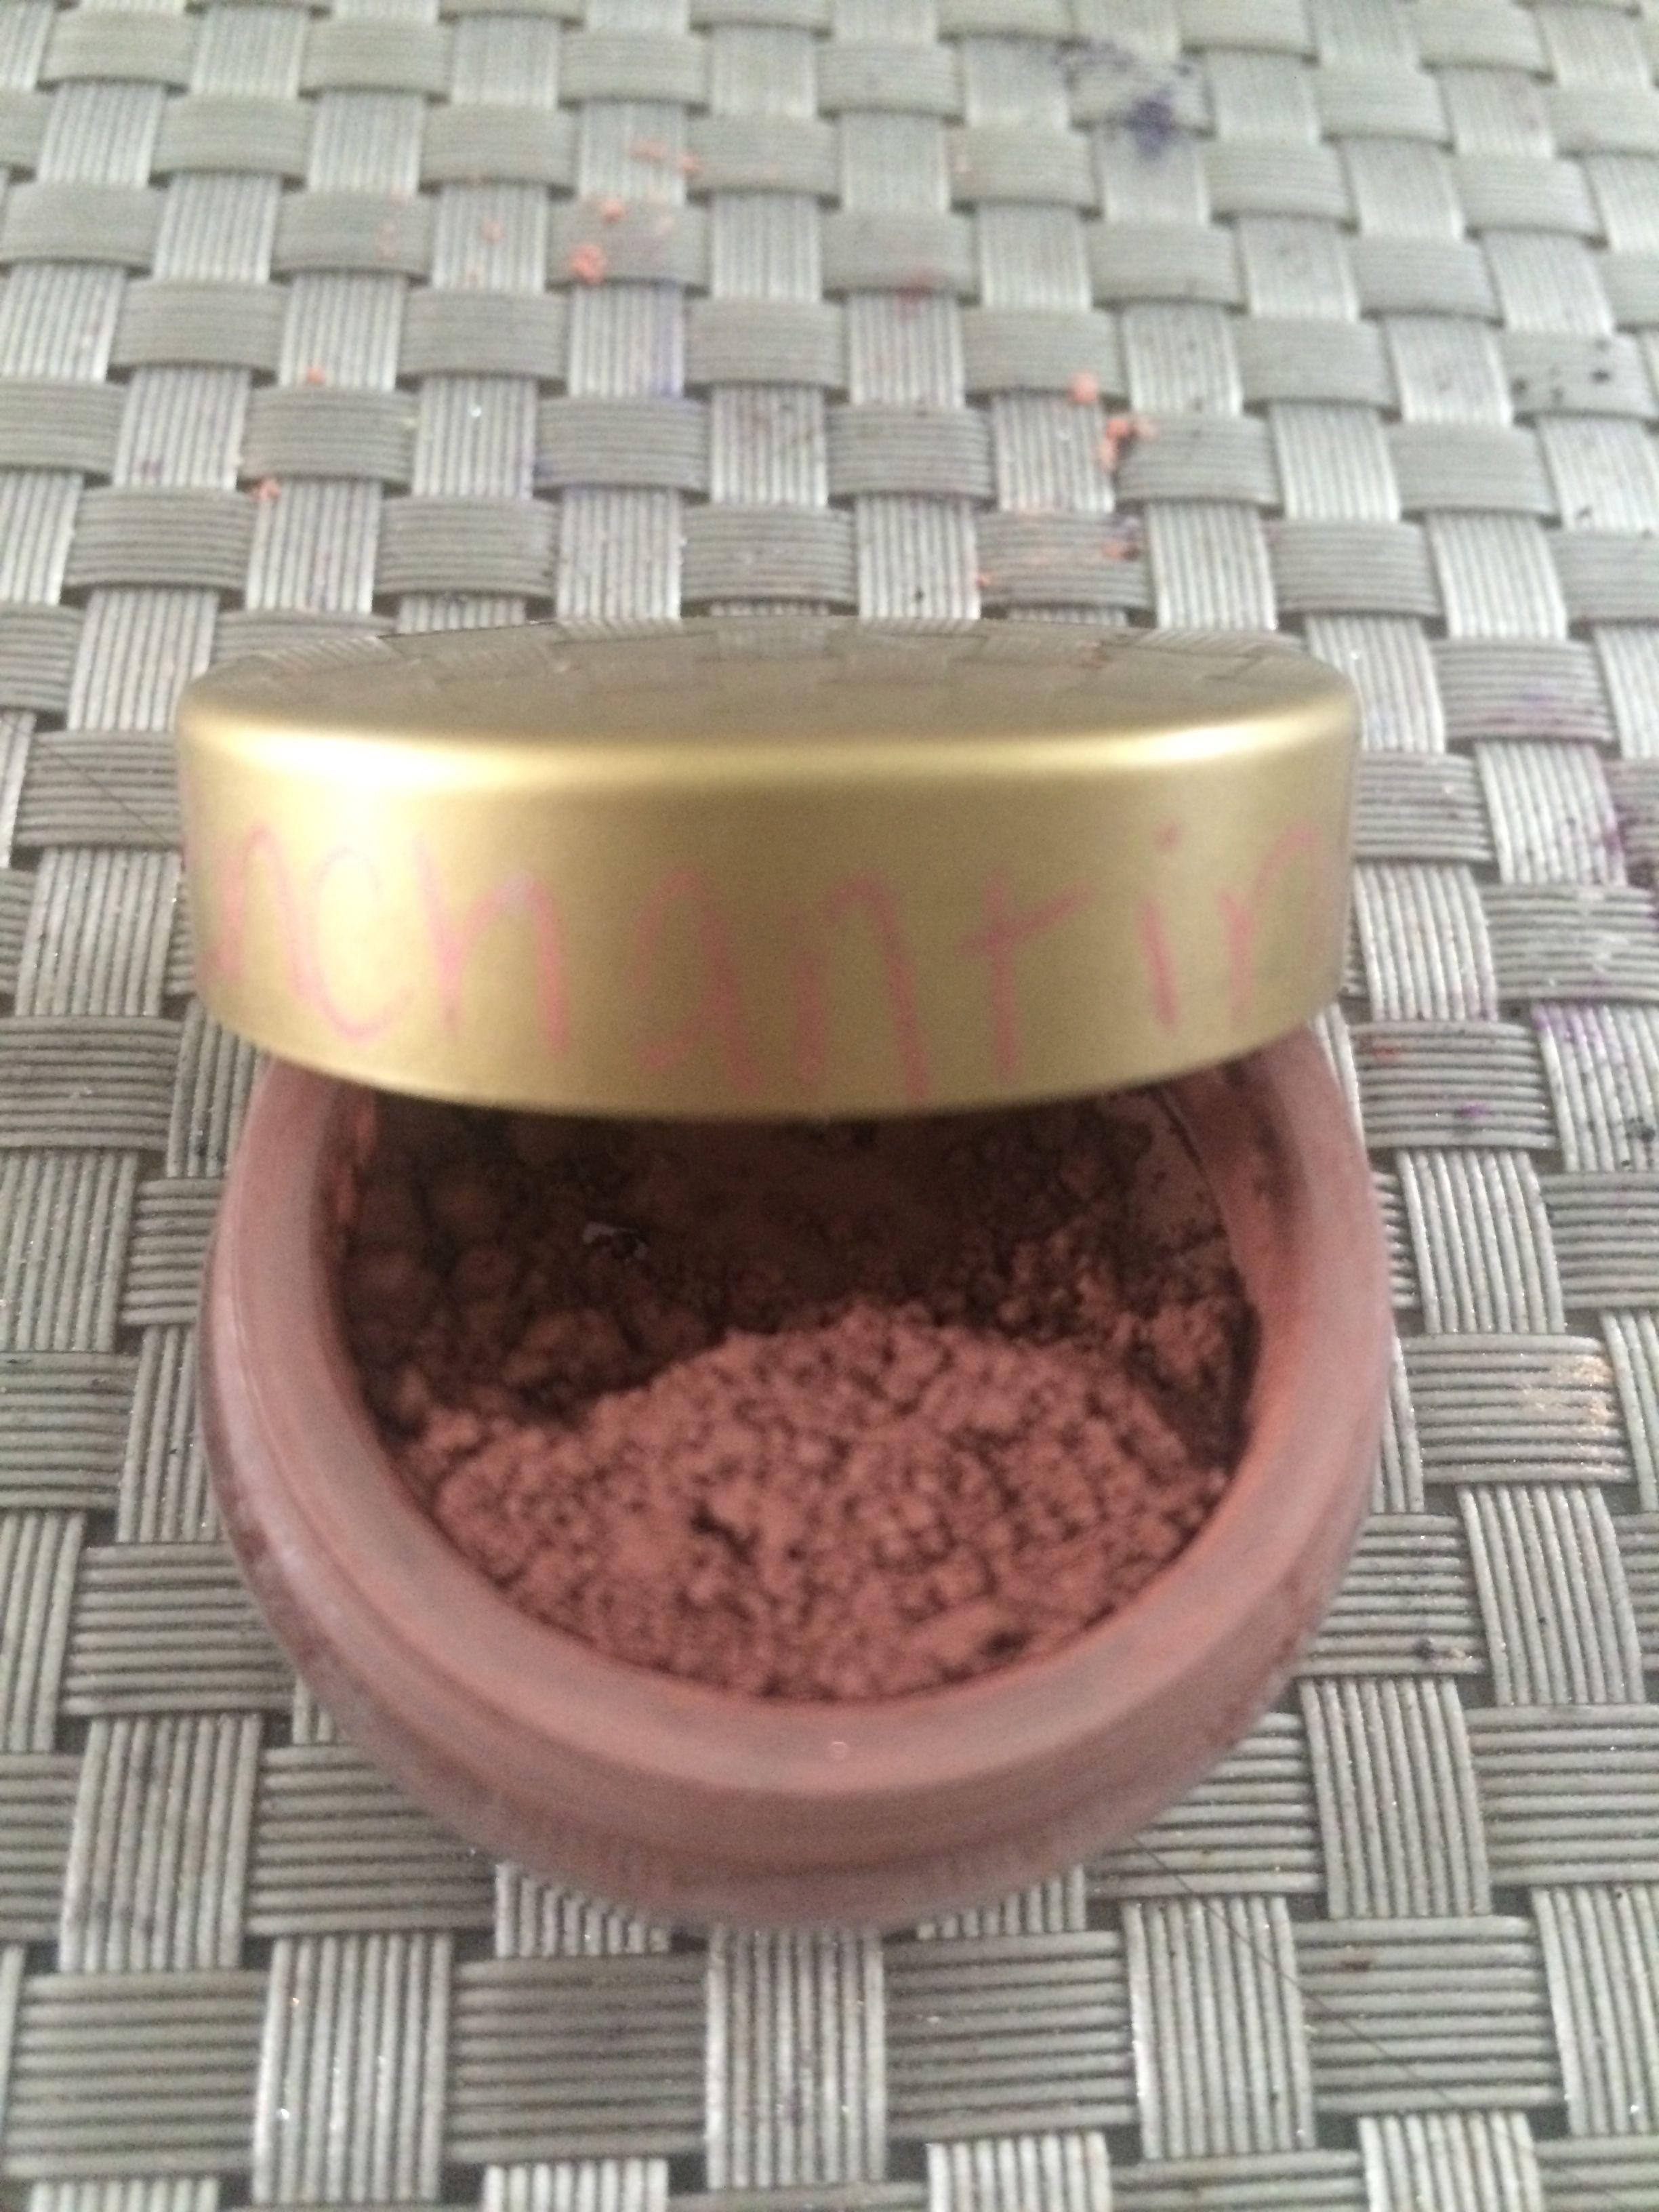 Bare Minerals Eyeshadow in Enchanting Diamond Full size